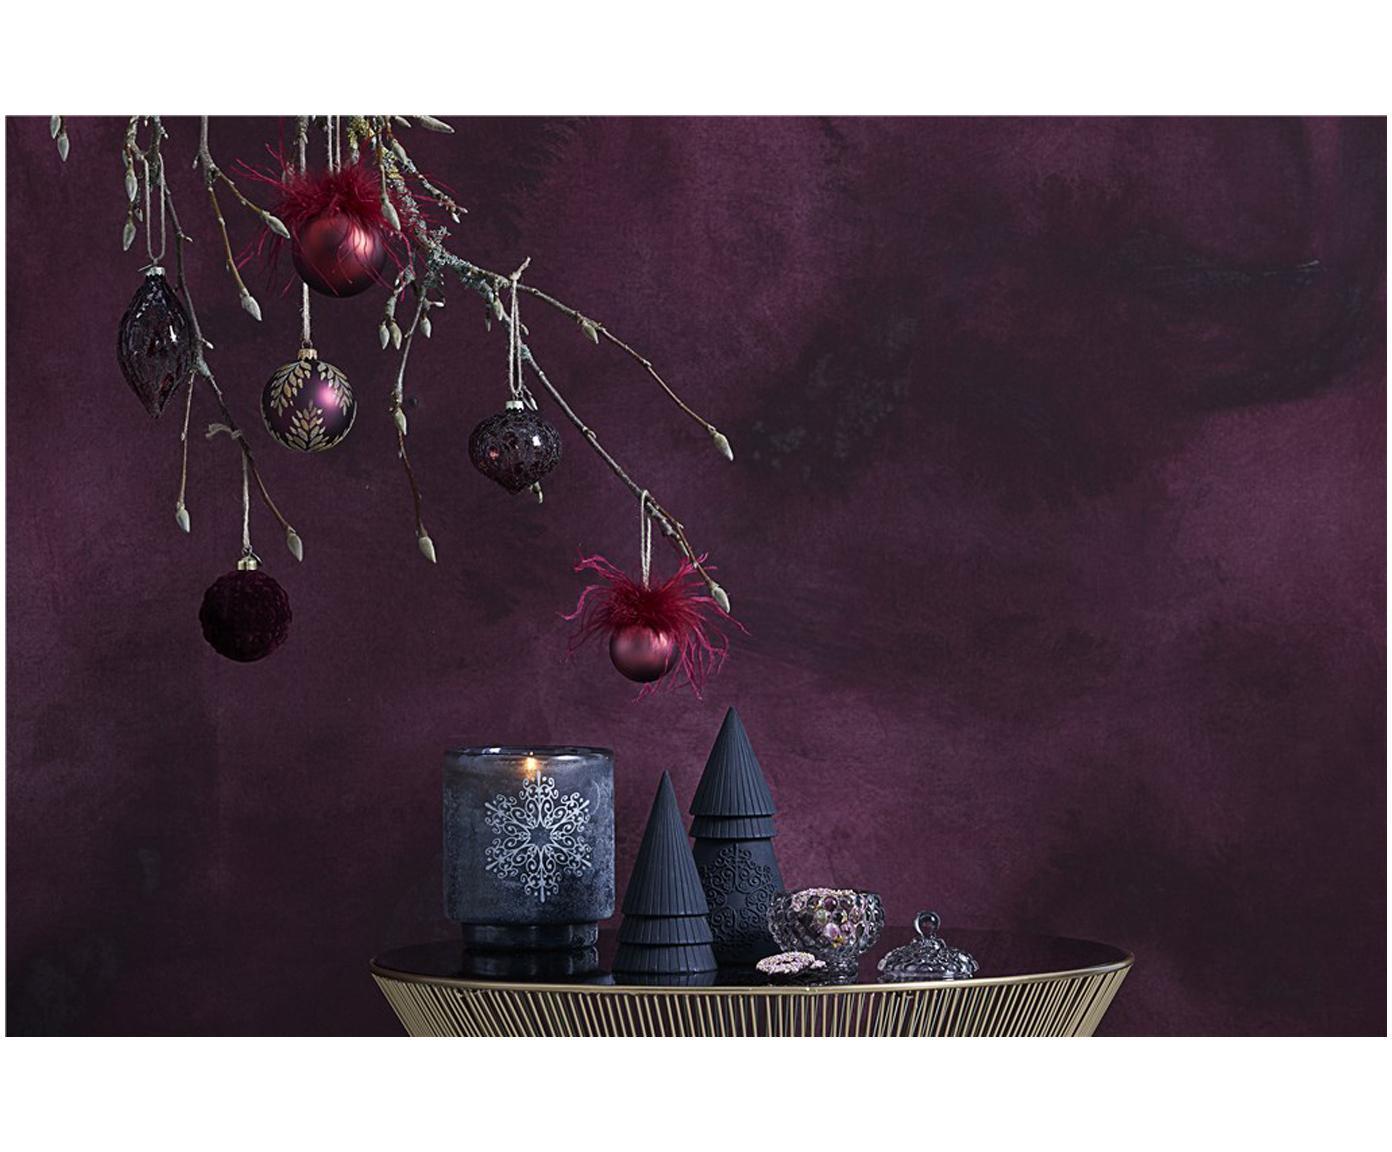 Palla di Natale Charity, 2 pz., Rosso scuro, Ø 8 x Alt. 8 cm